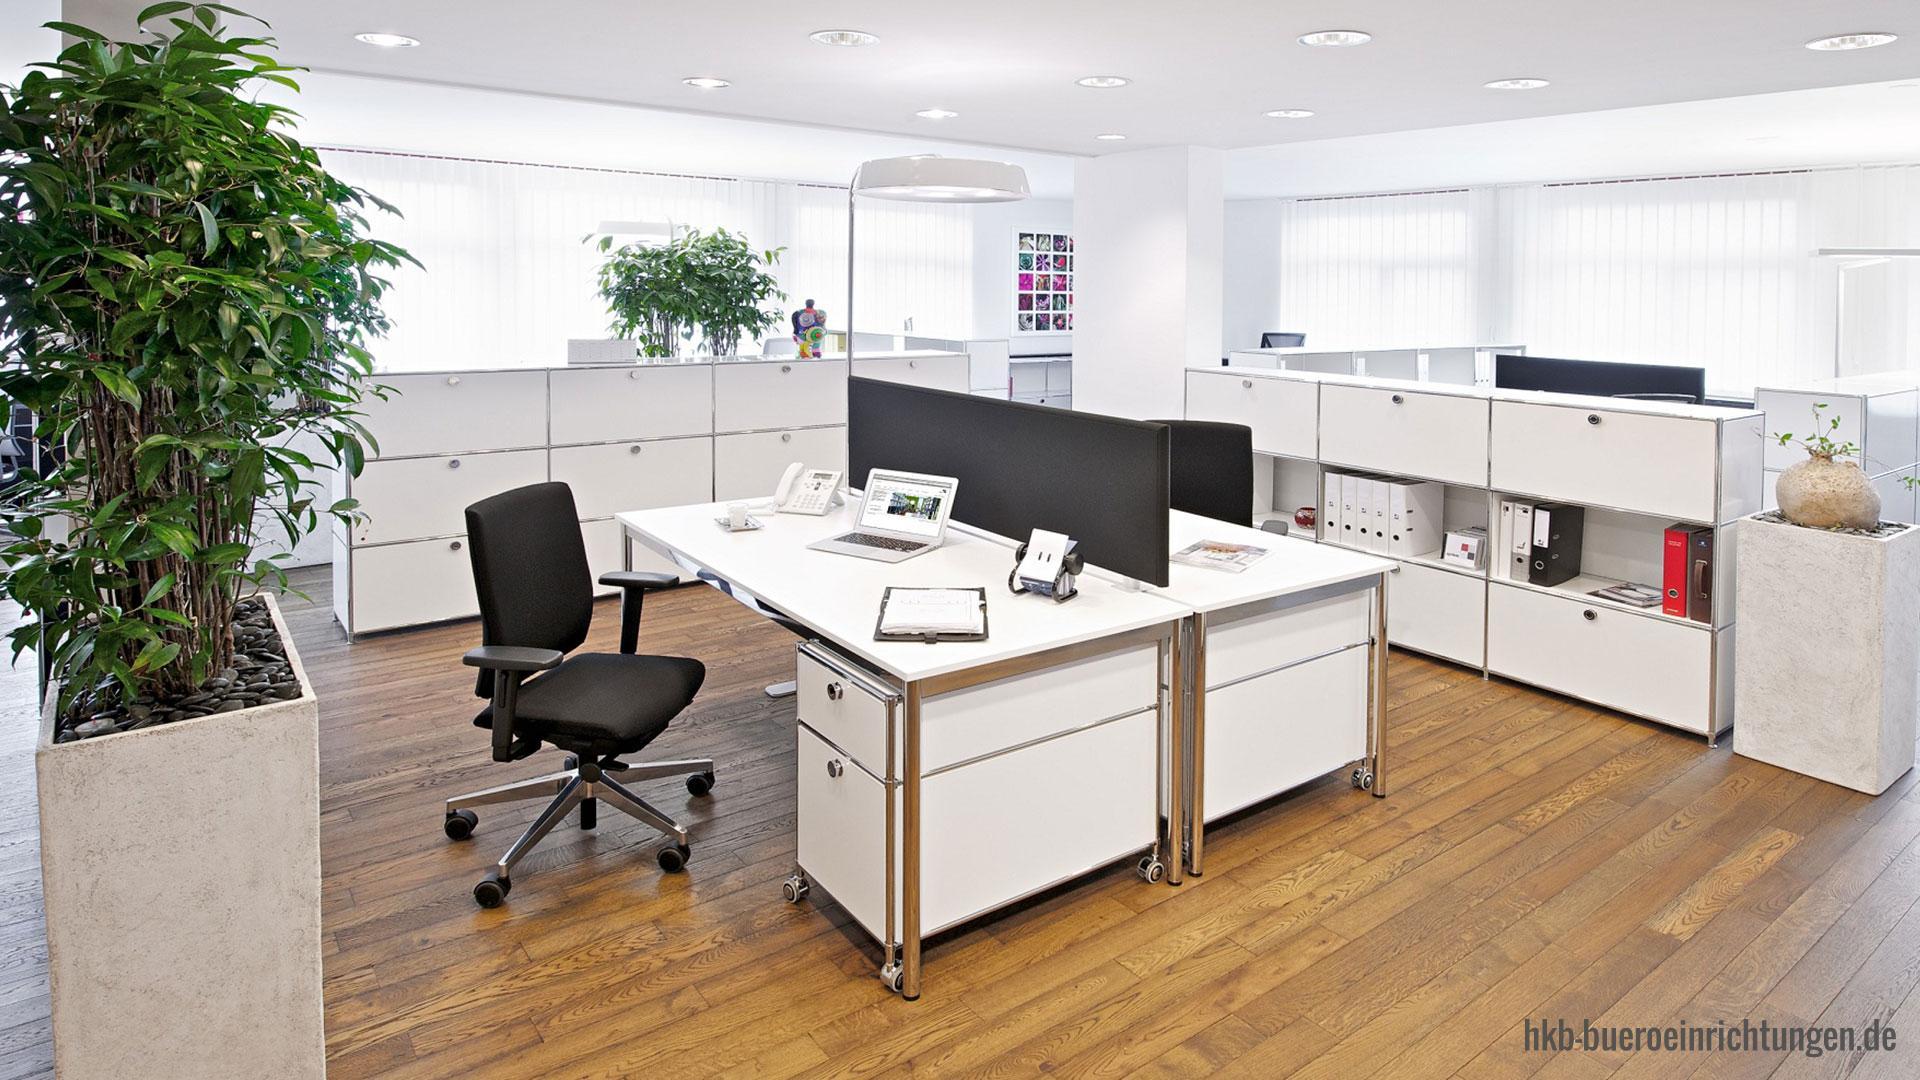 metall büromöbel schreibtisch büroregale metallstuhl